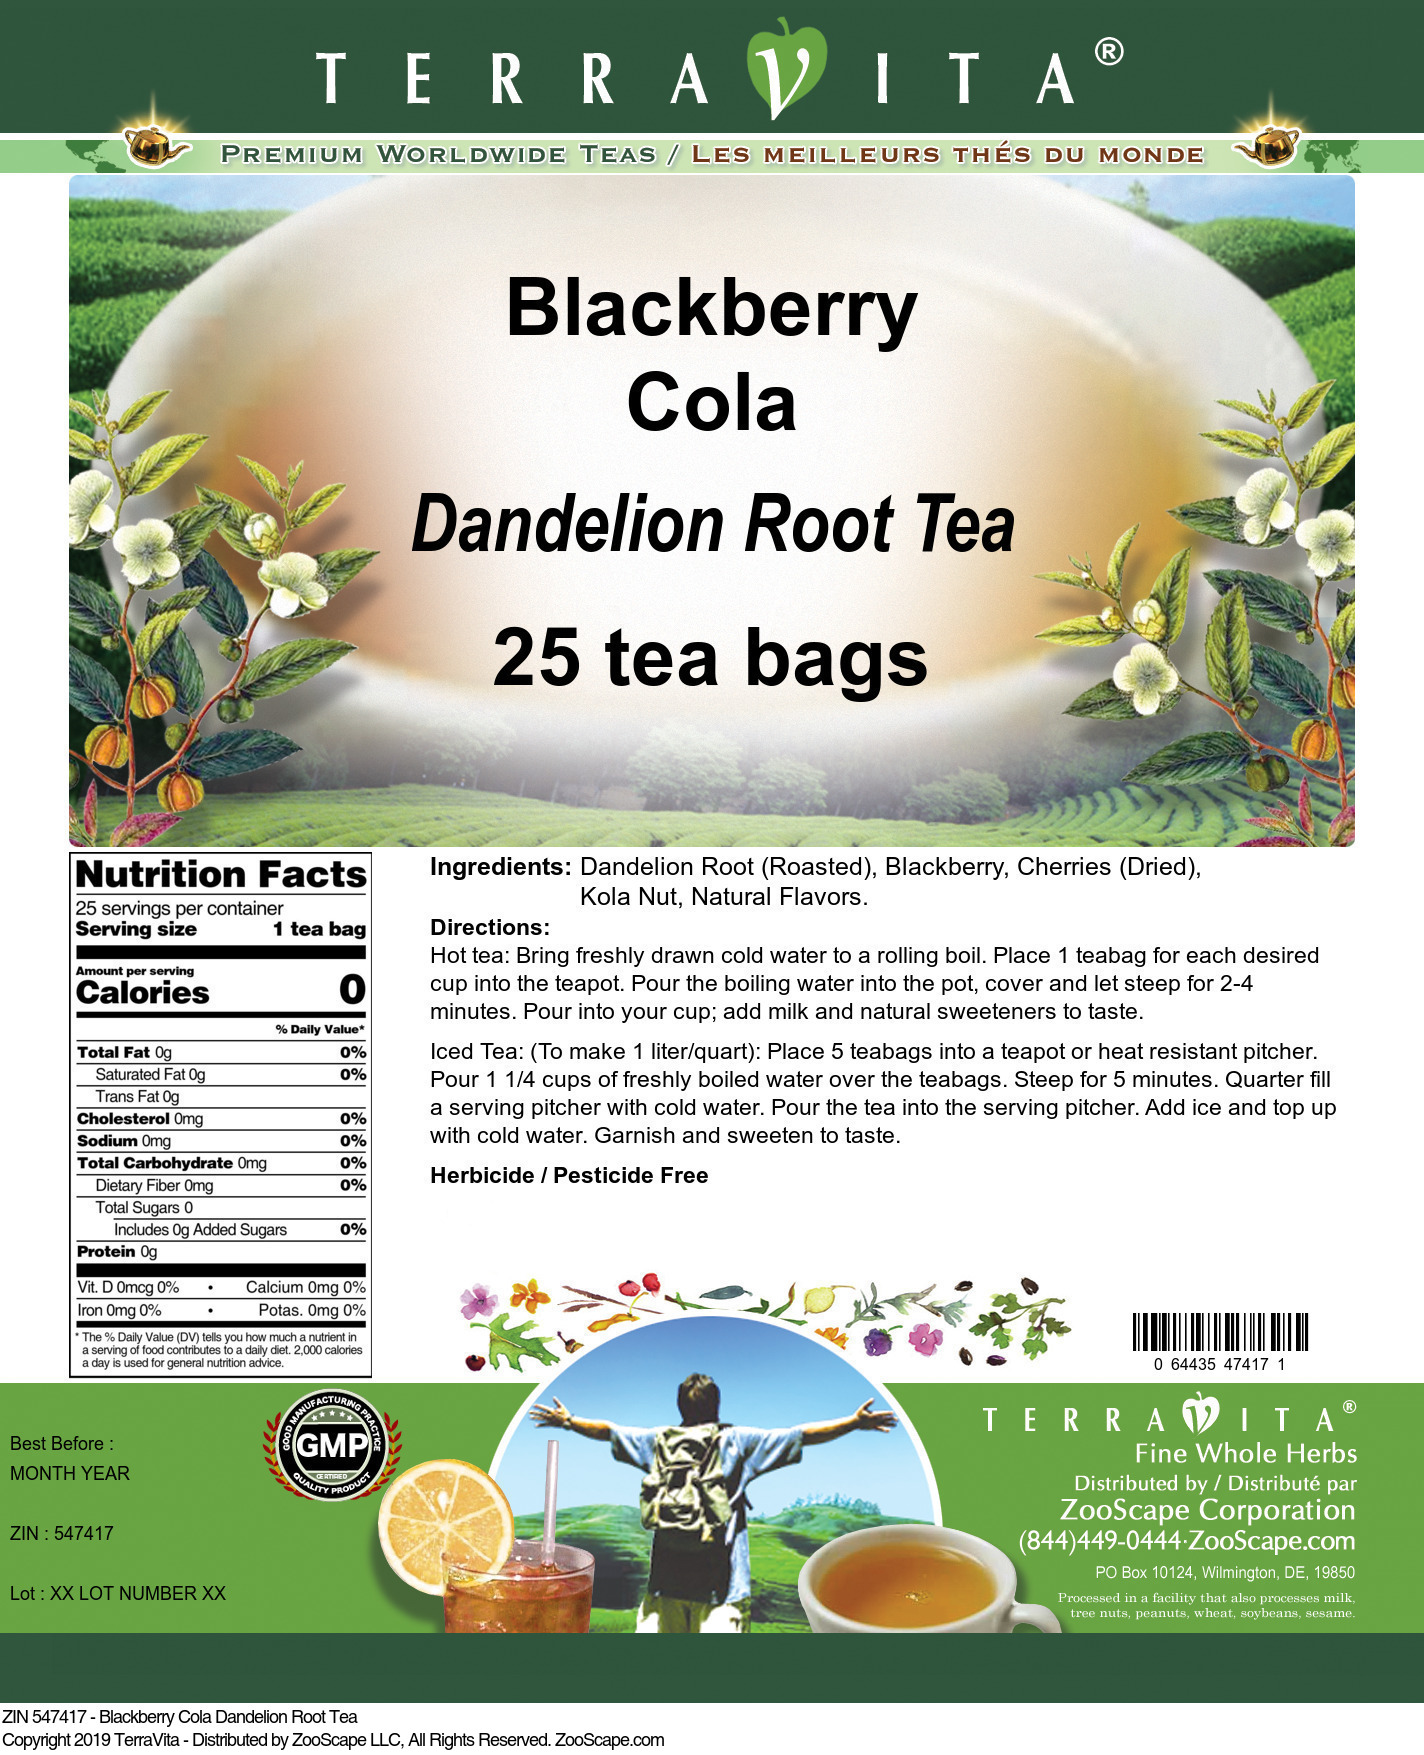 Blackberry Cola Dandelion Root